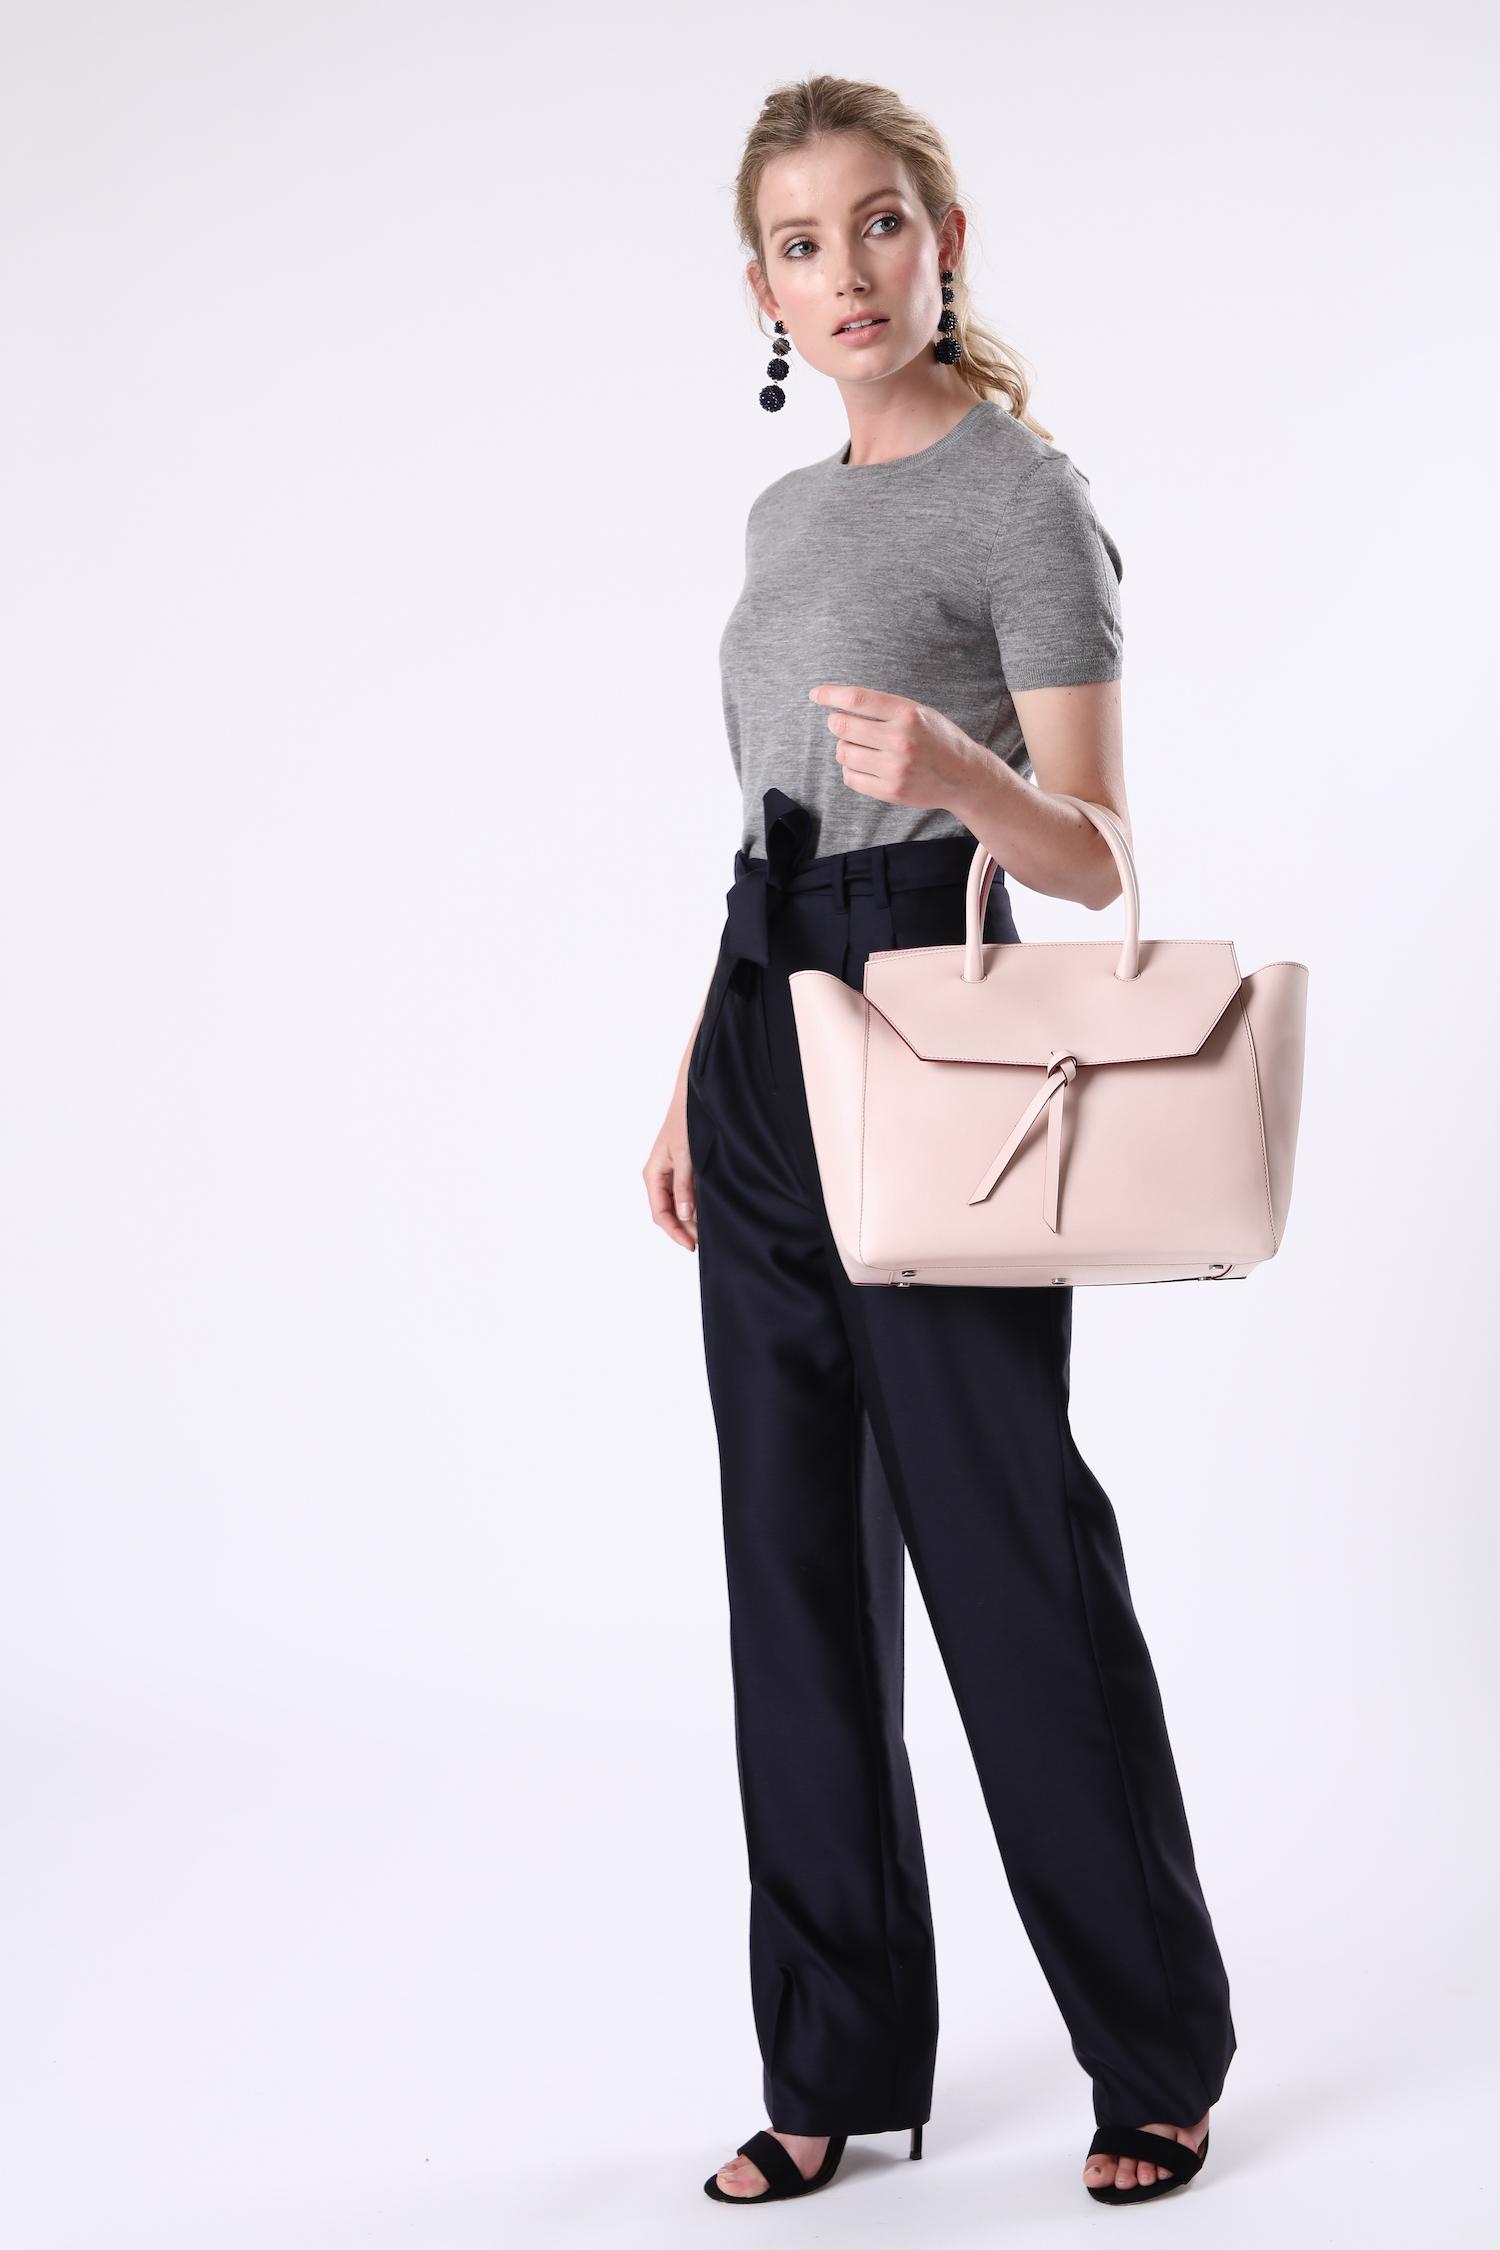 Alexandra de Curtis Blush Pink Loren Tote Leather Handbag work tote